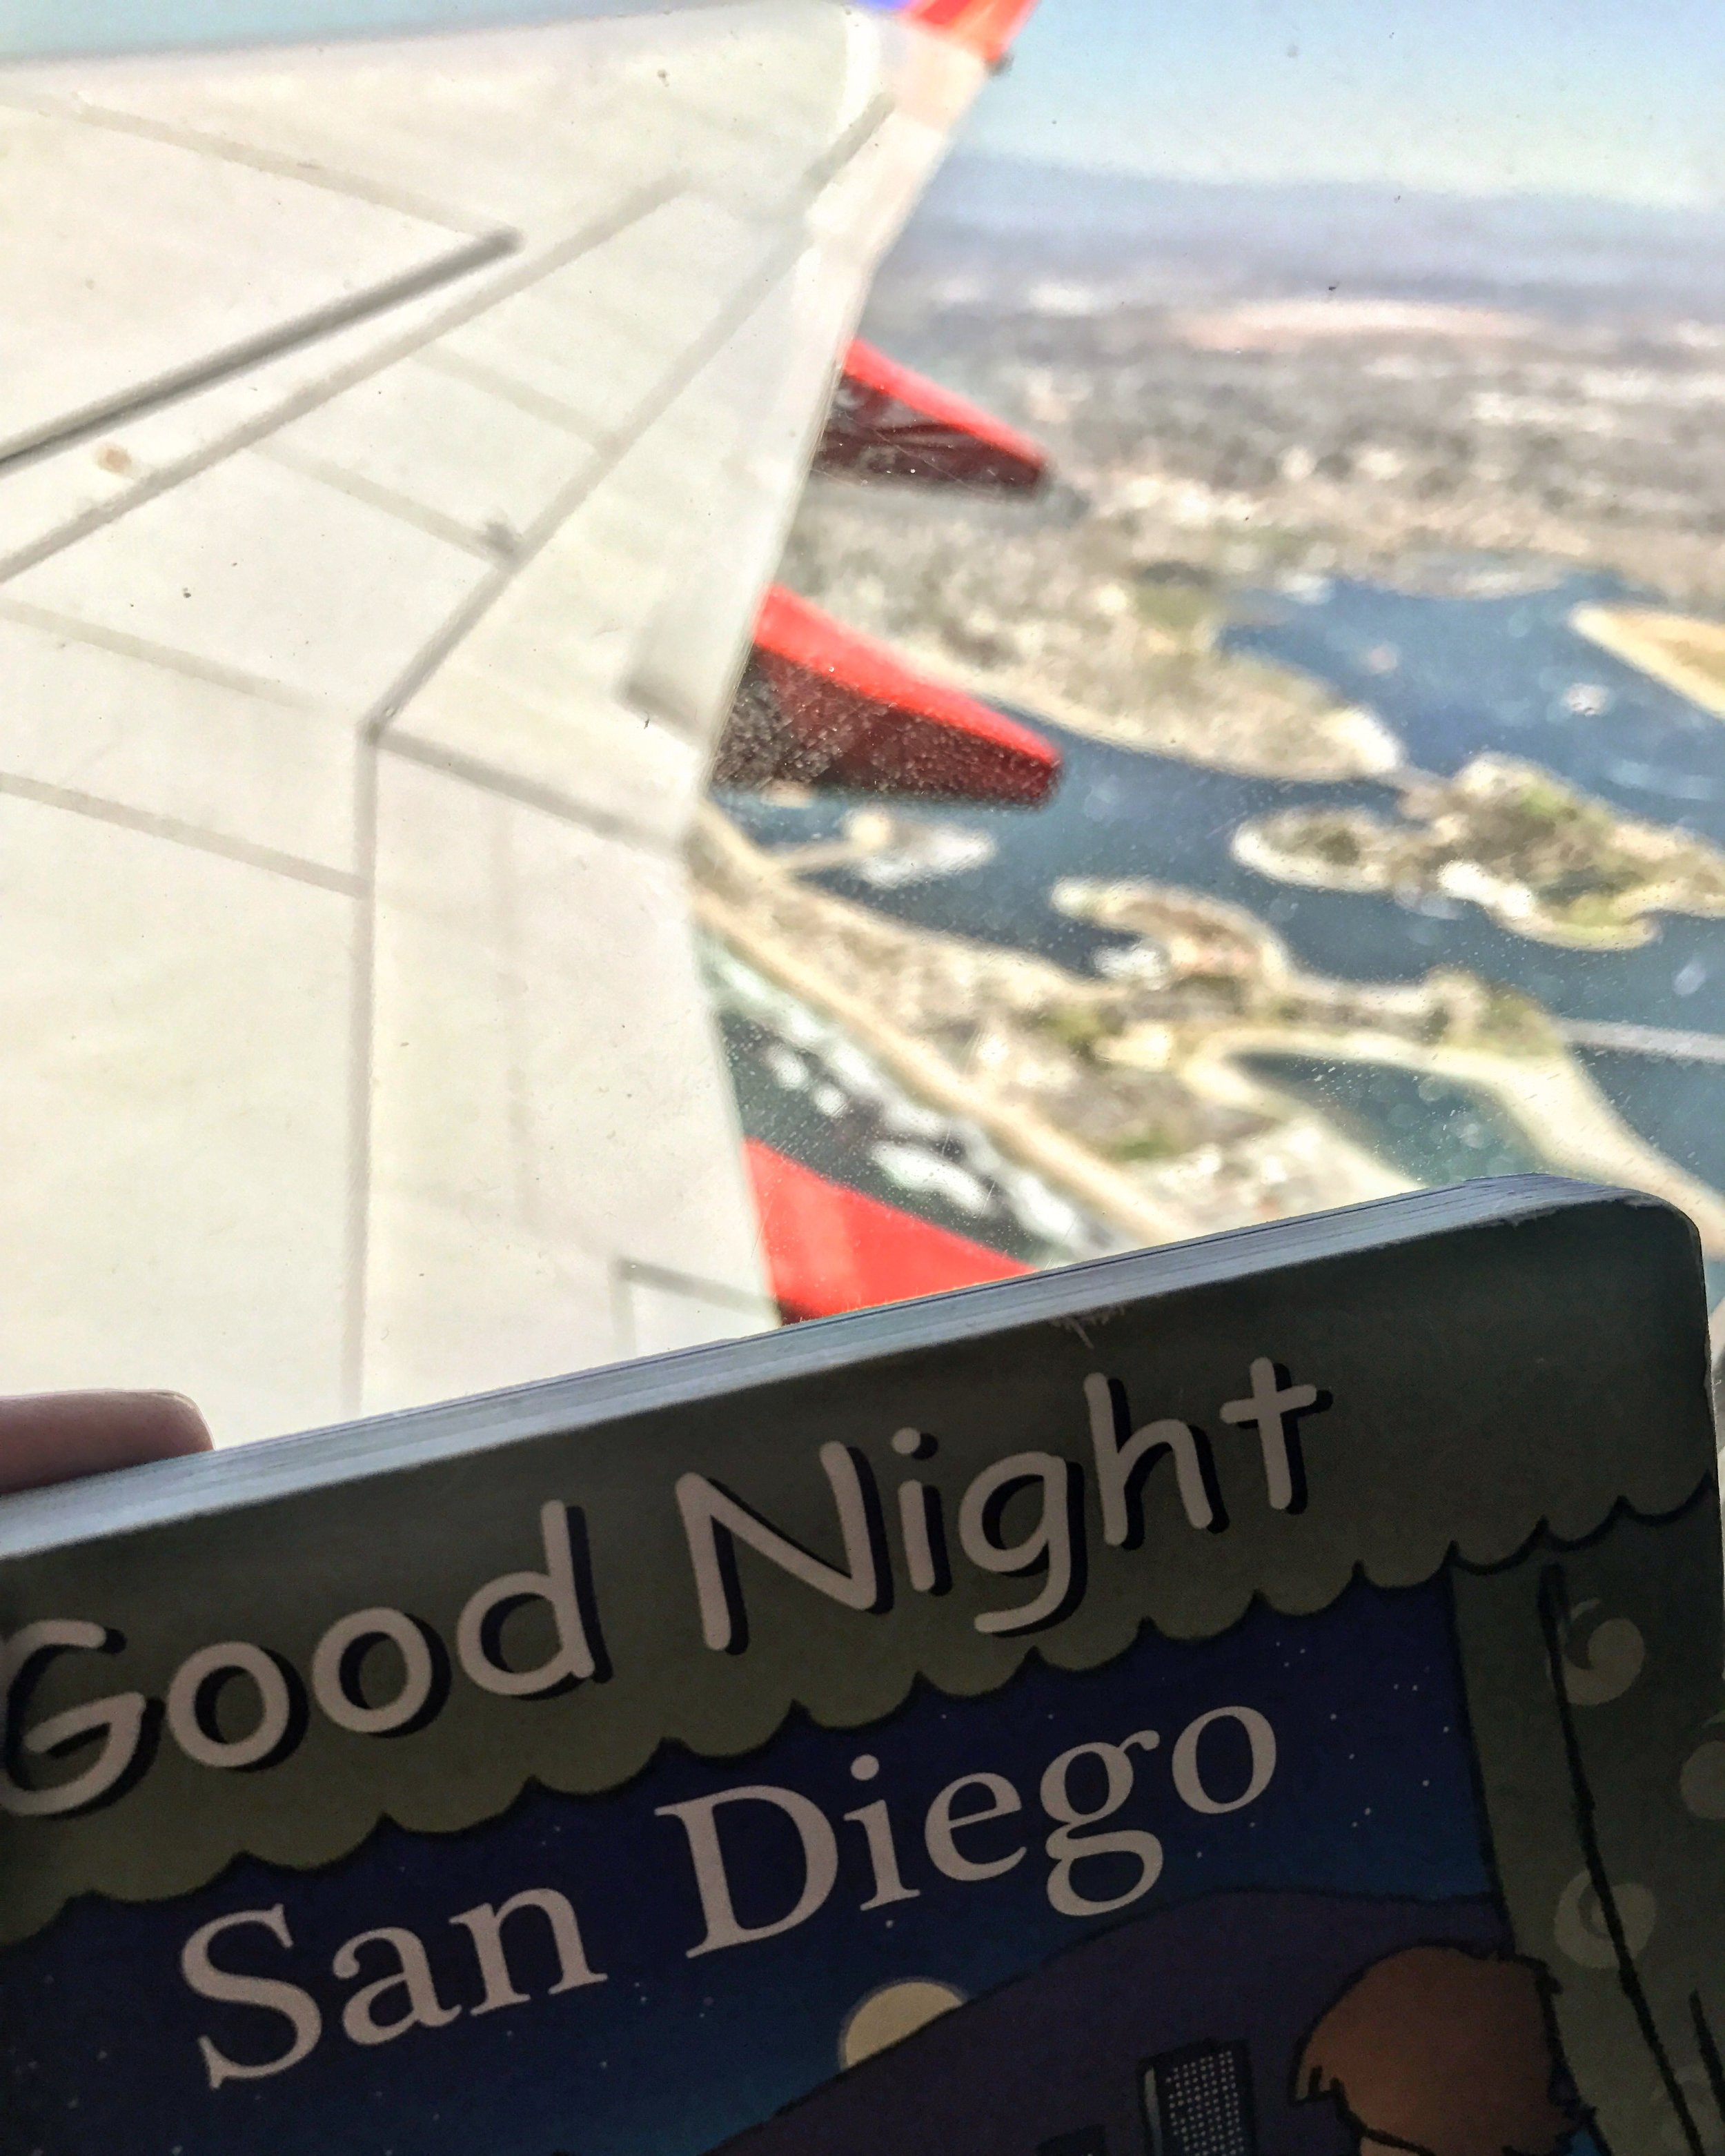 Goodnight San Diego